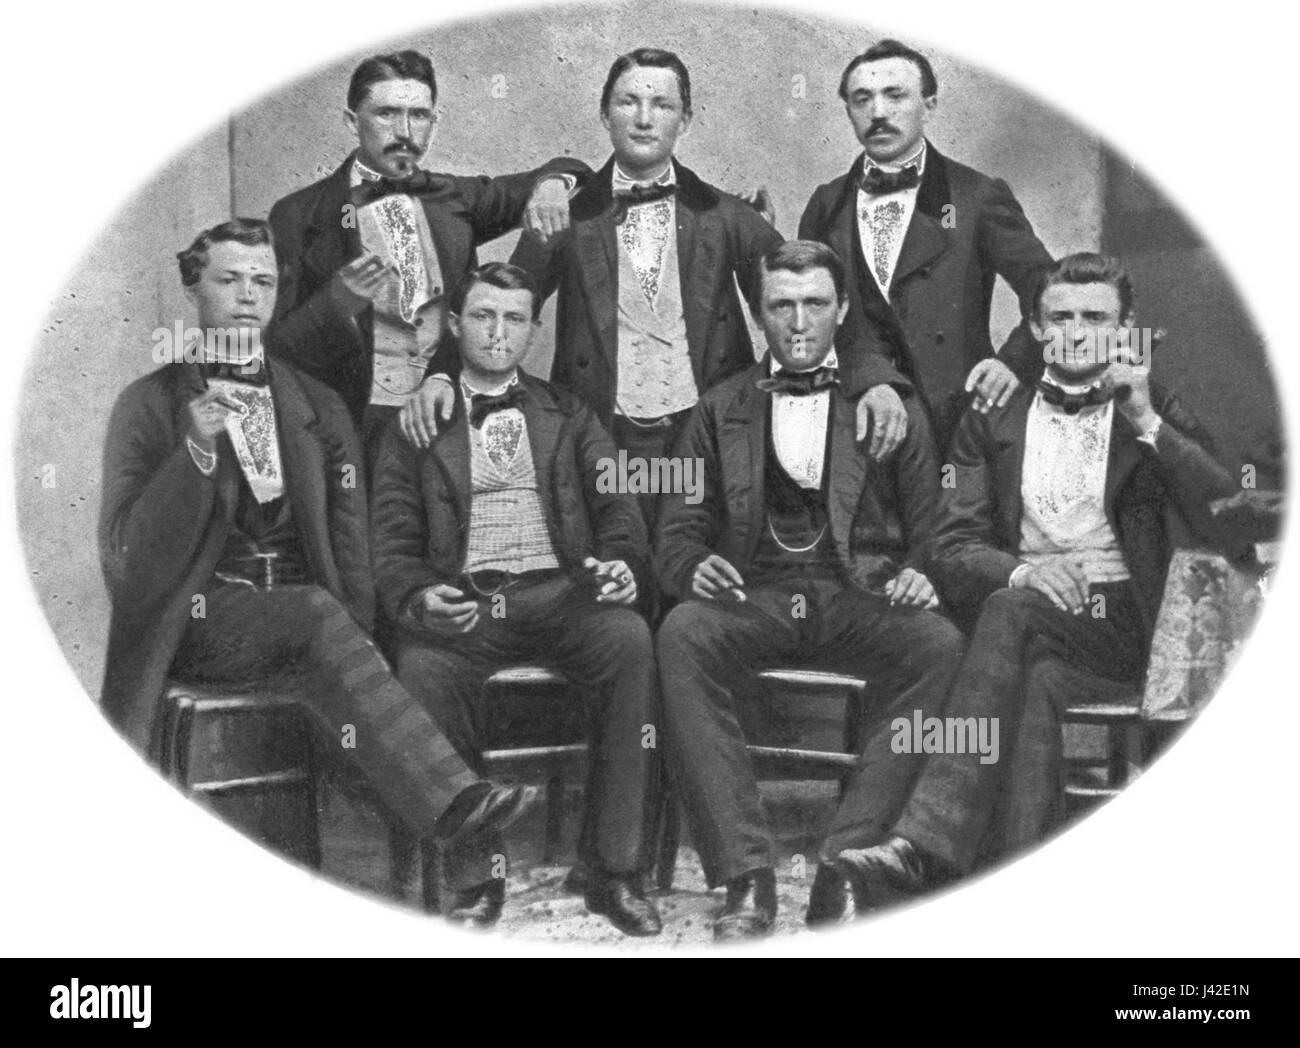 Mens group 1880 hg - Stock Image